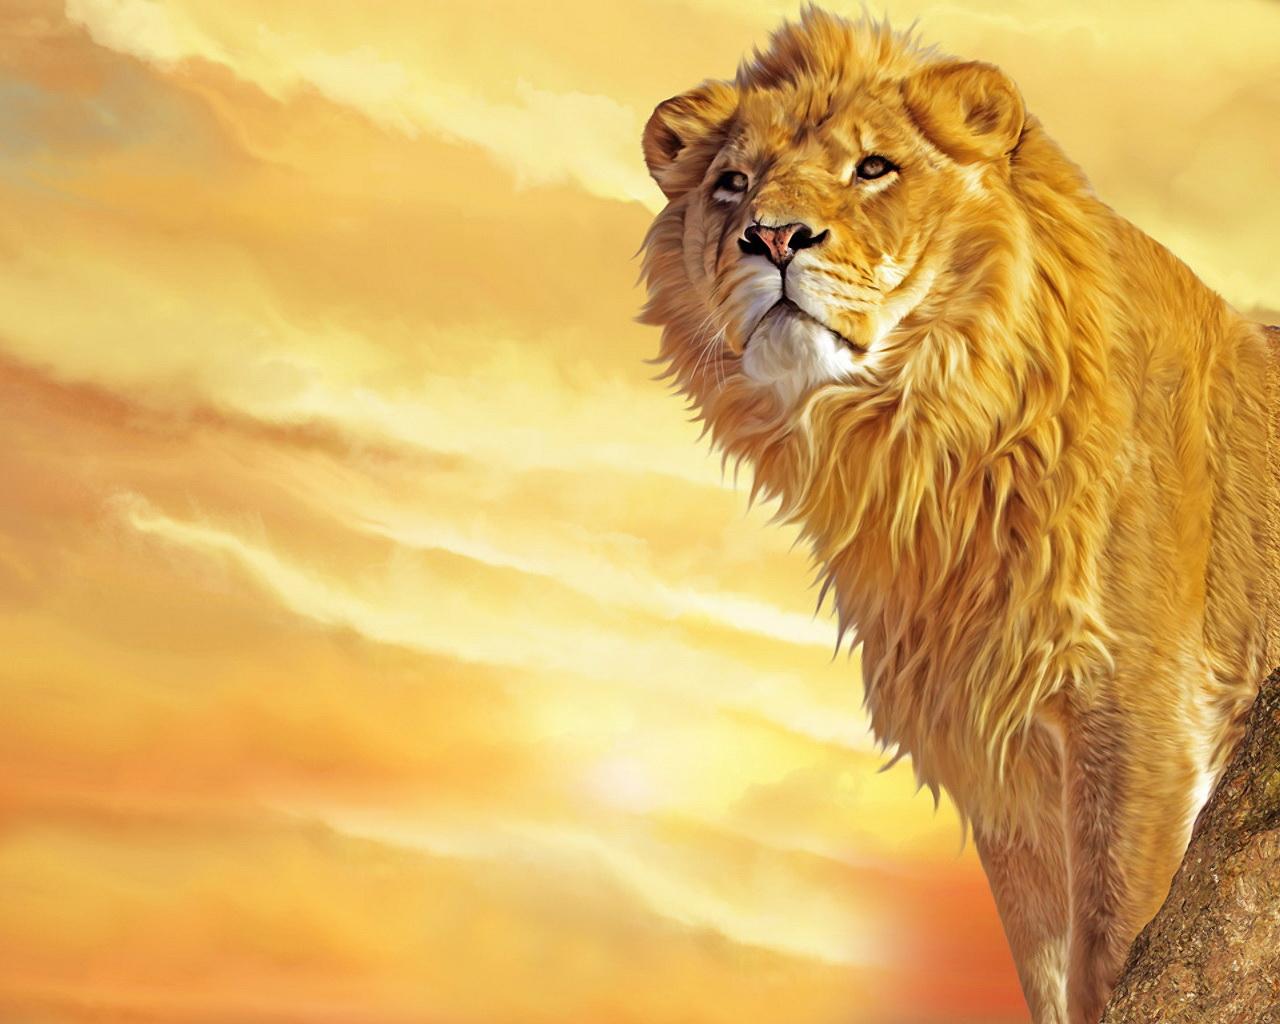 http://3.bp.blogspot.com/-xKkjwpIdBsI/UCXI53AP-wI/AAAAAAAAAOg/TgeDU12-Jxg/s1600/Lion_king_wallpaper.jpg